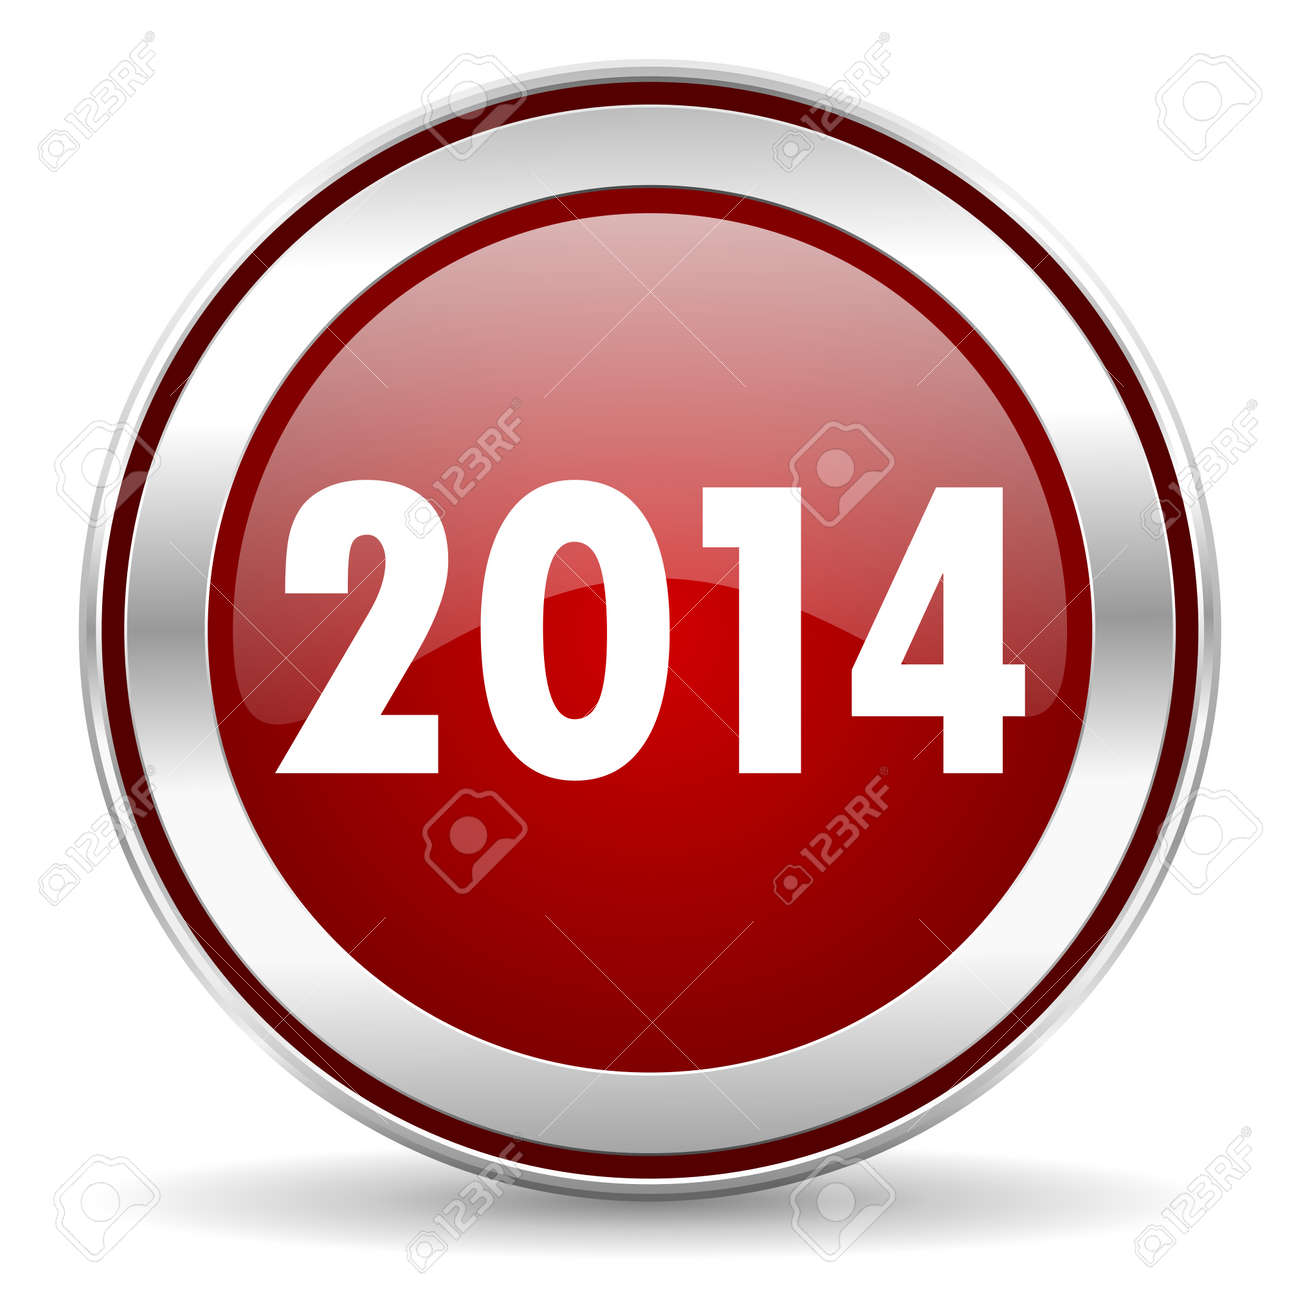 year 2014 icon Stock Photo - 22901803